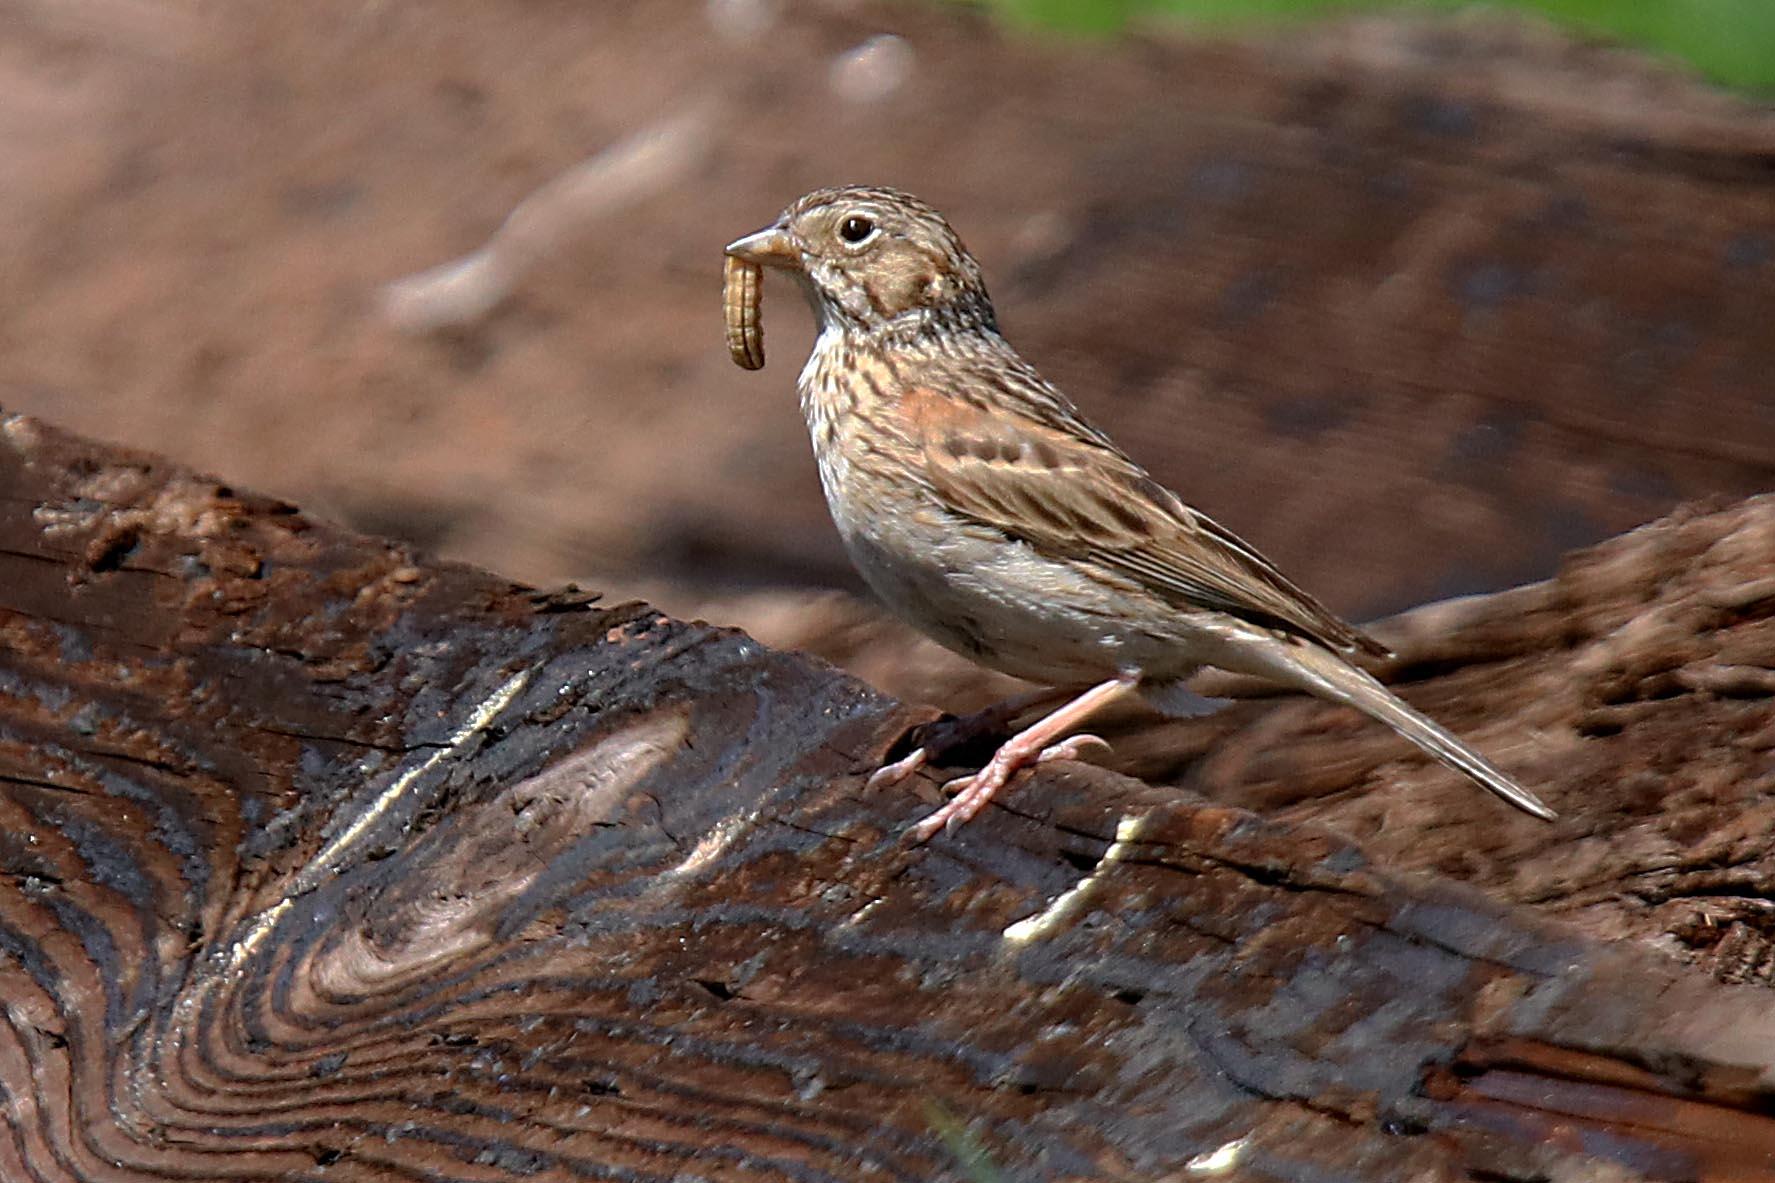 The Oregon Vesper Sparrow parent forages grubs for its nestlings. Picture by Mel Clements